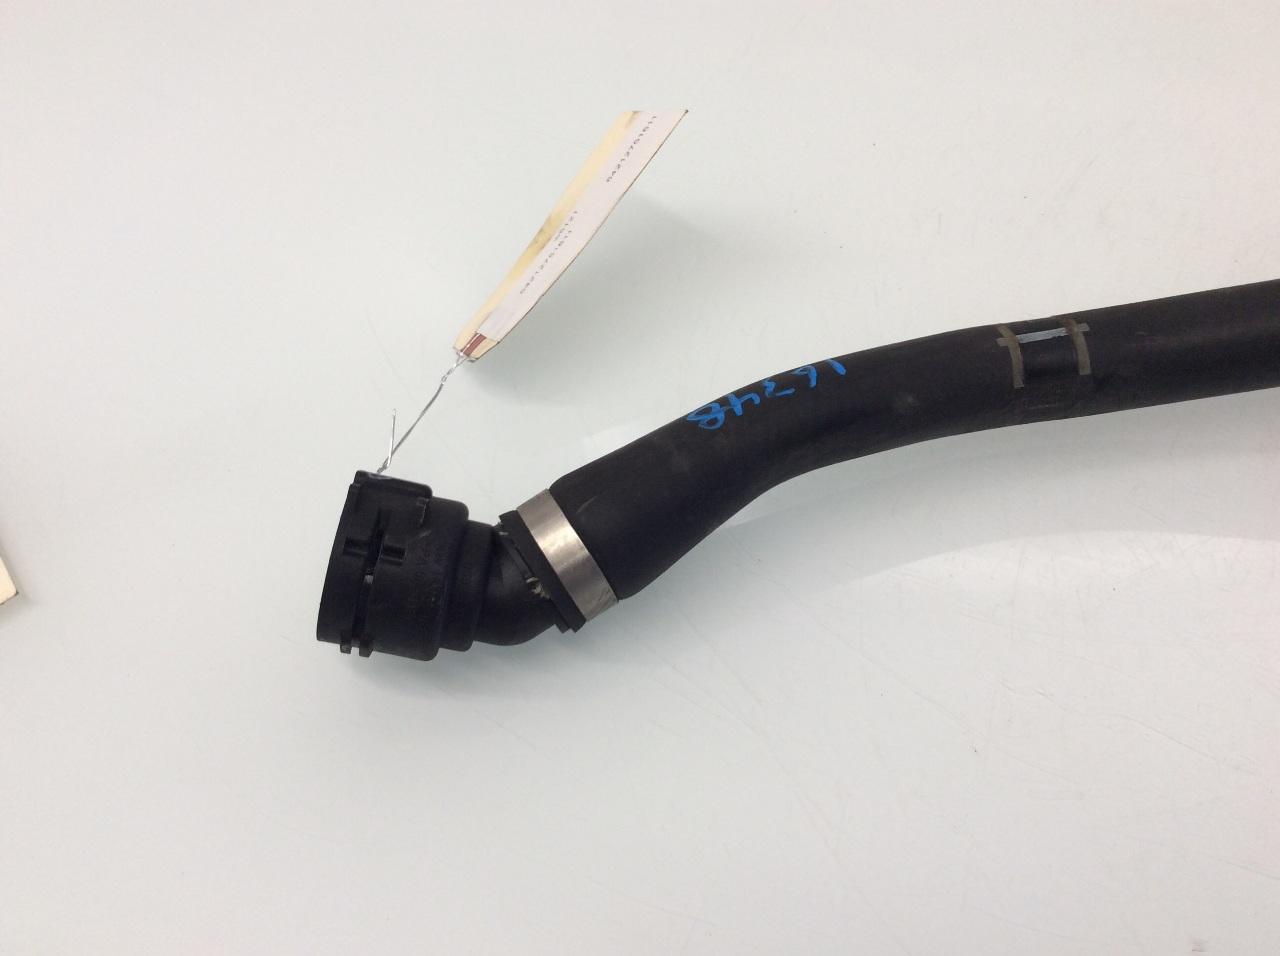 how to change coolant on mini cooper